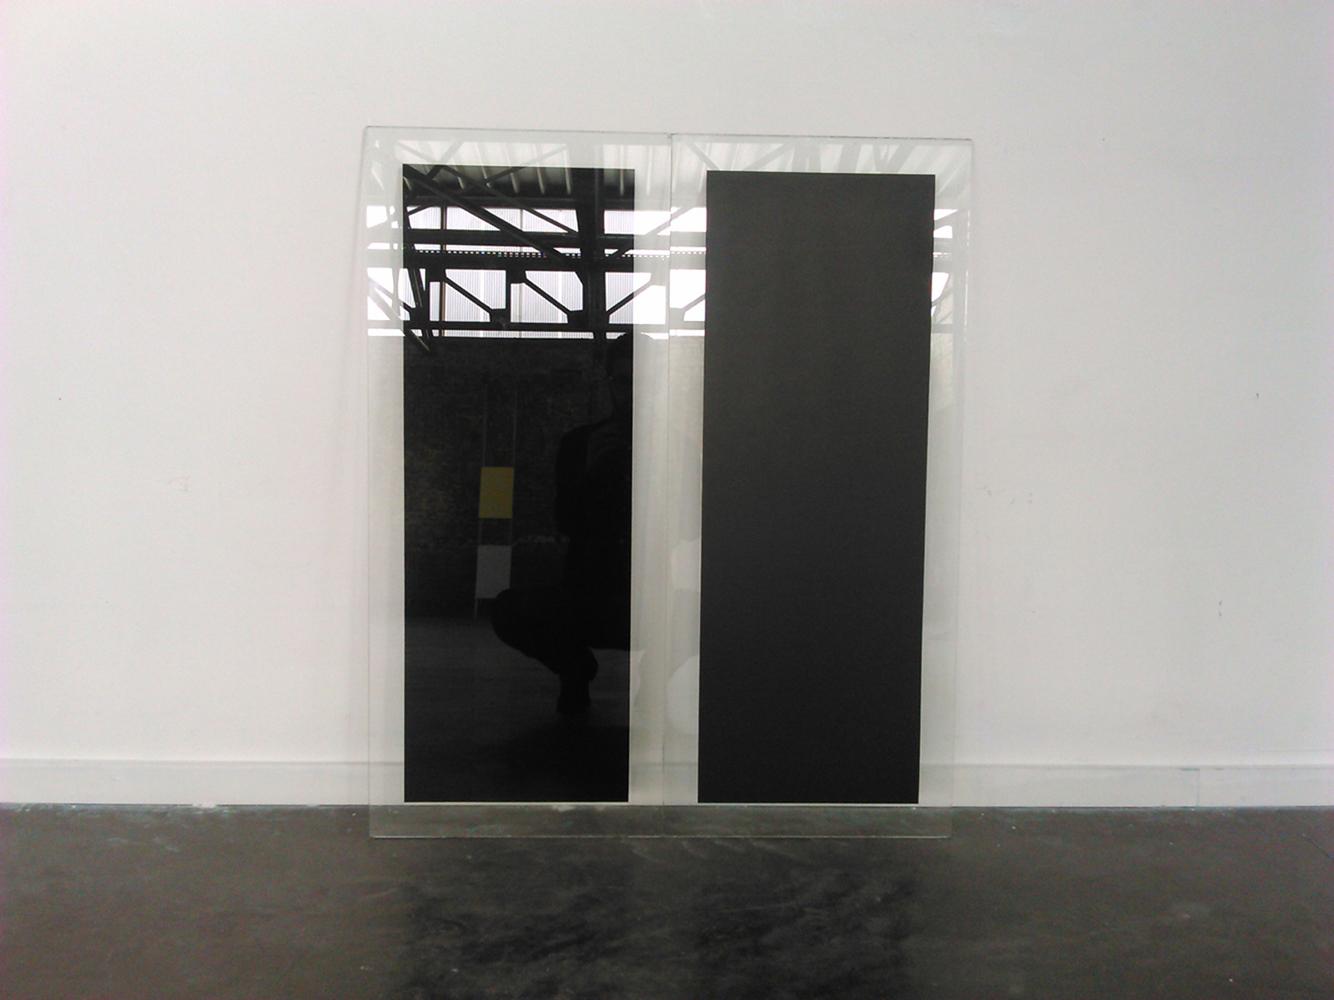 Intervalle, 2015, acrylic on glass, 97 x 82 x 12 cm